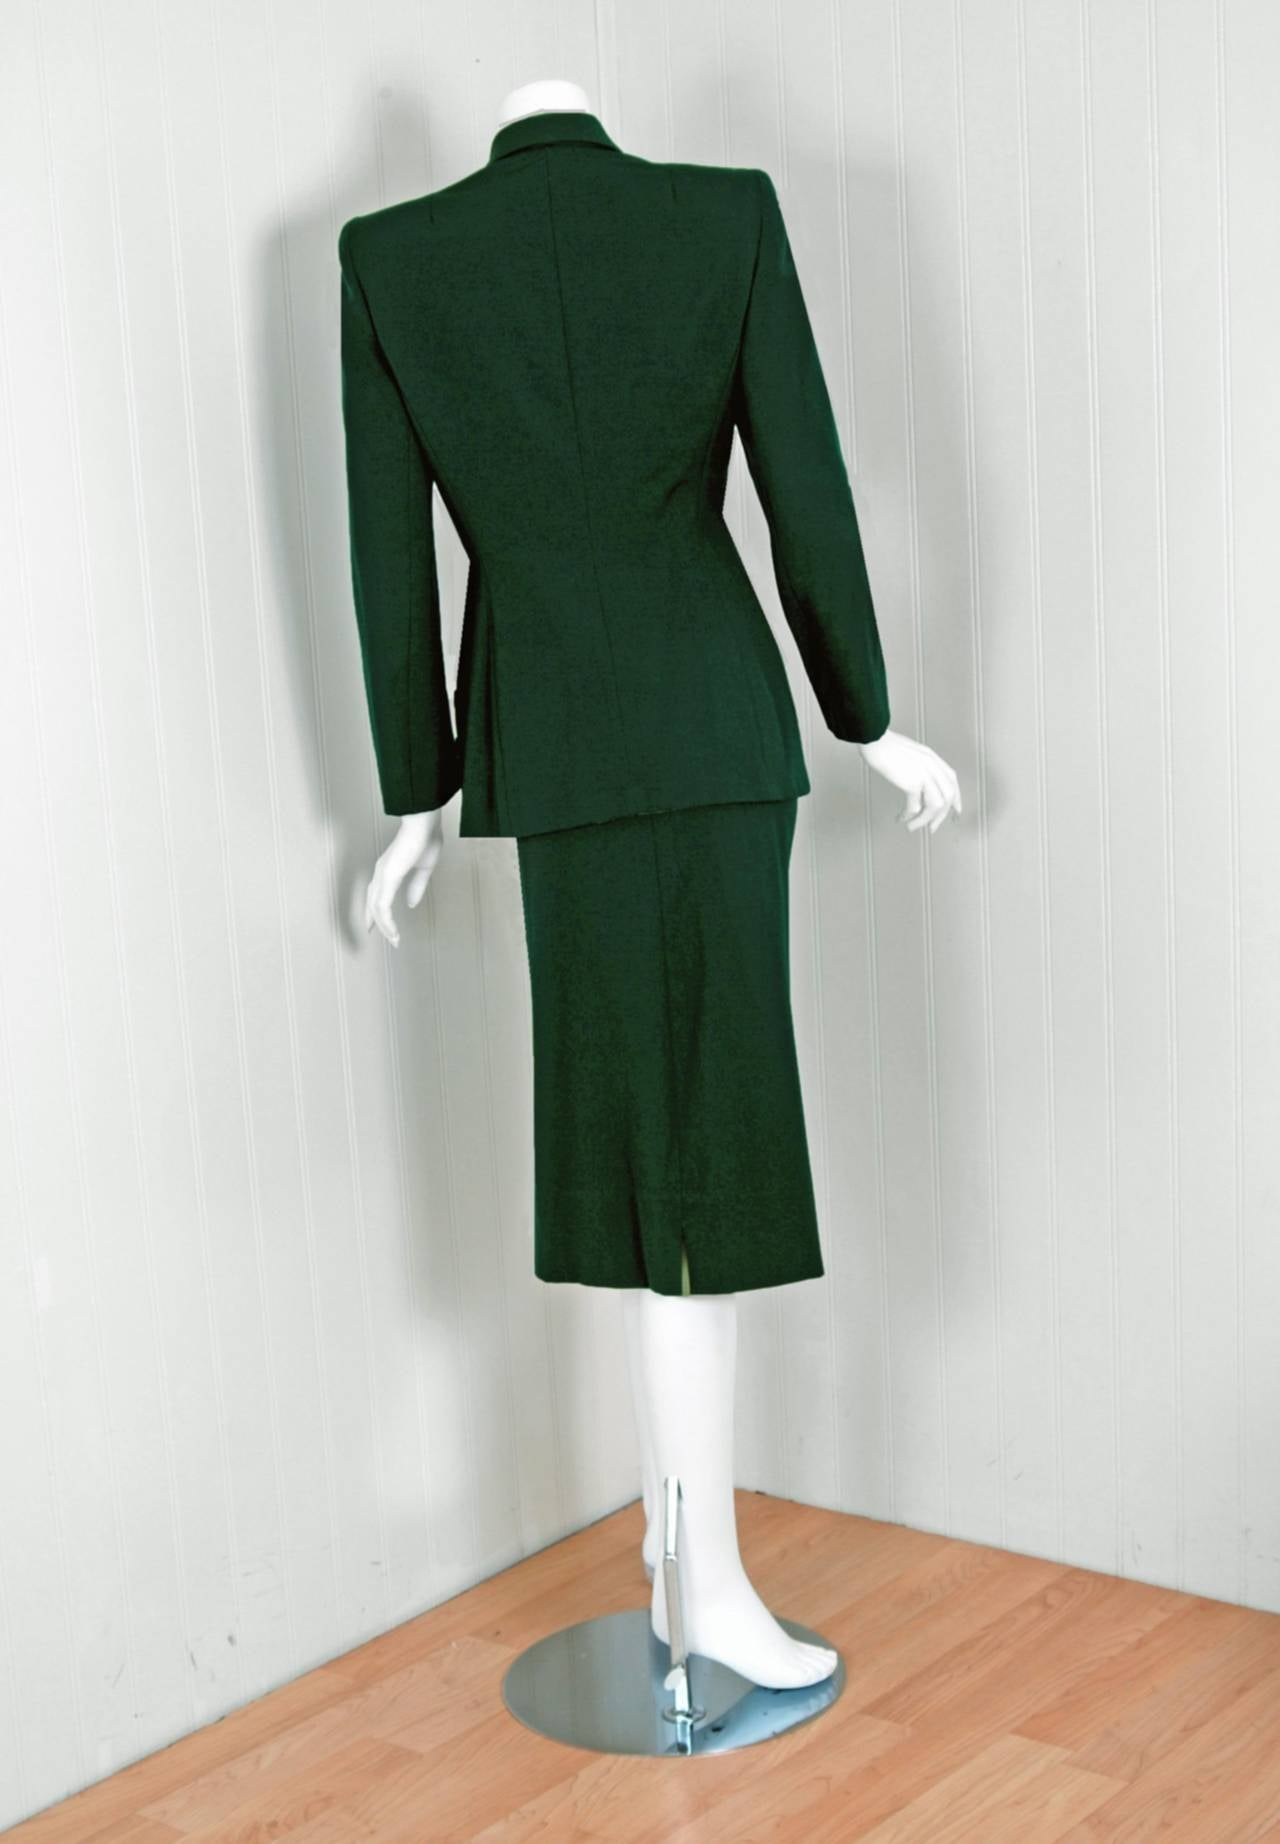 1940u0027s elegant forestgreen gabardine decopockets tailored jacket u0026 skirt